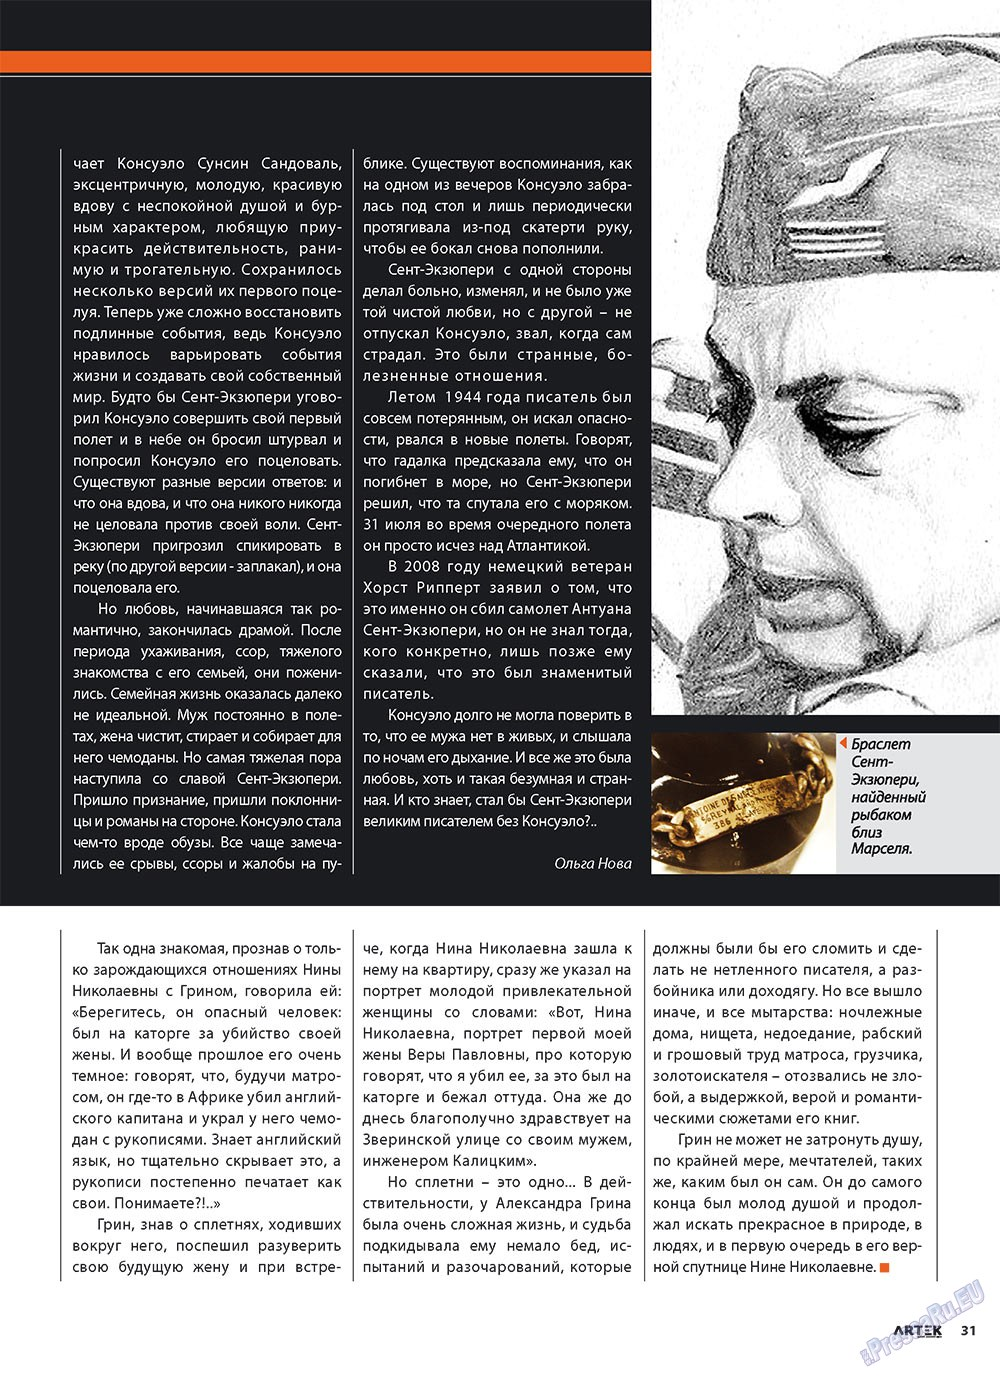 Артек (журнал). 2010 год, номер 3, стр. 33